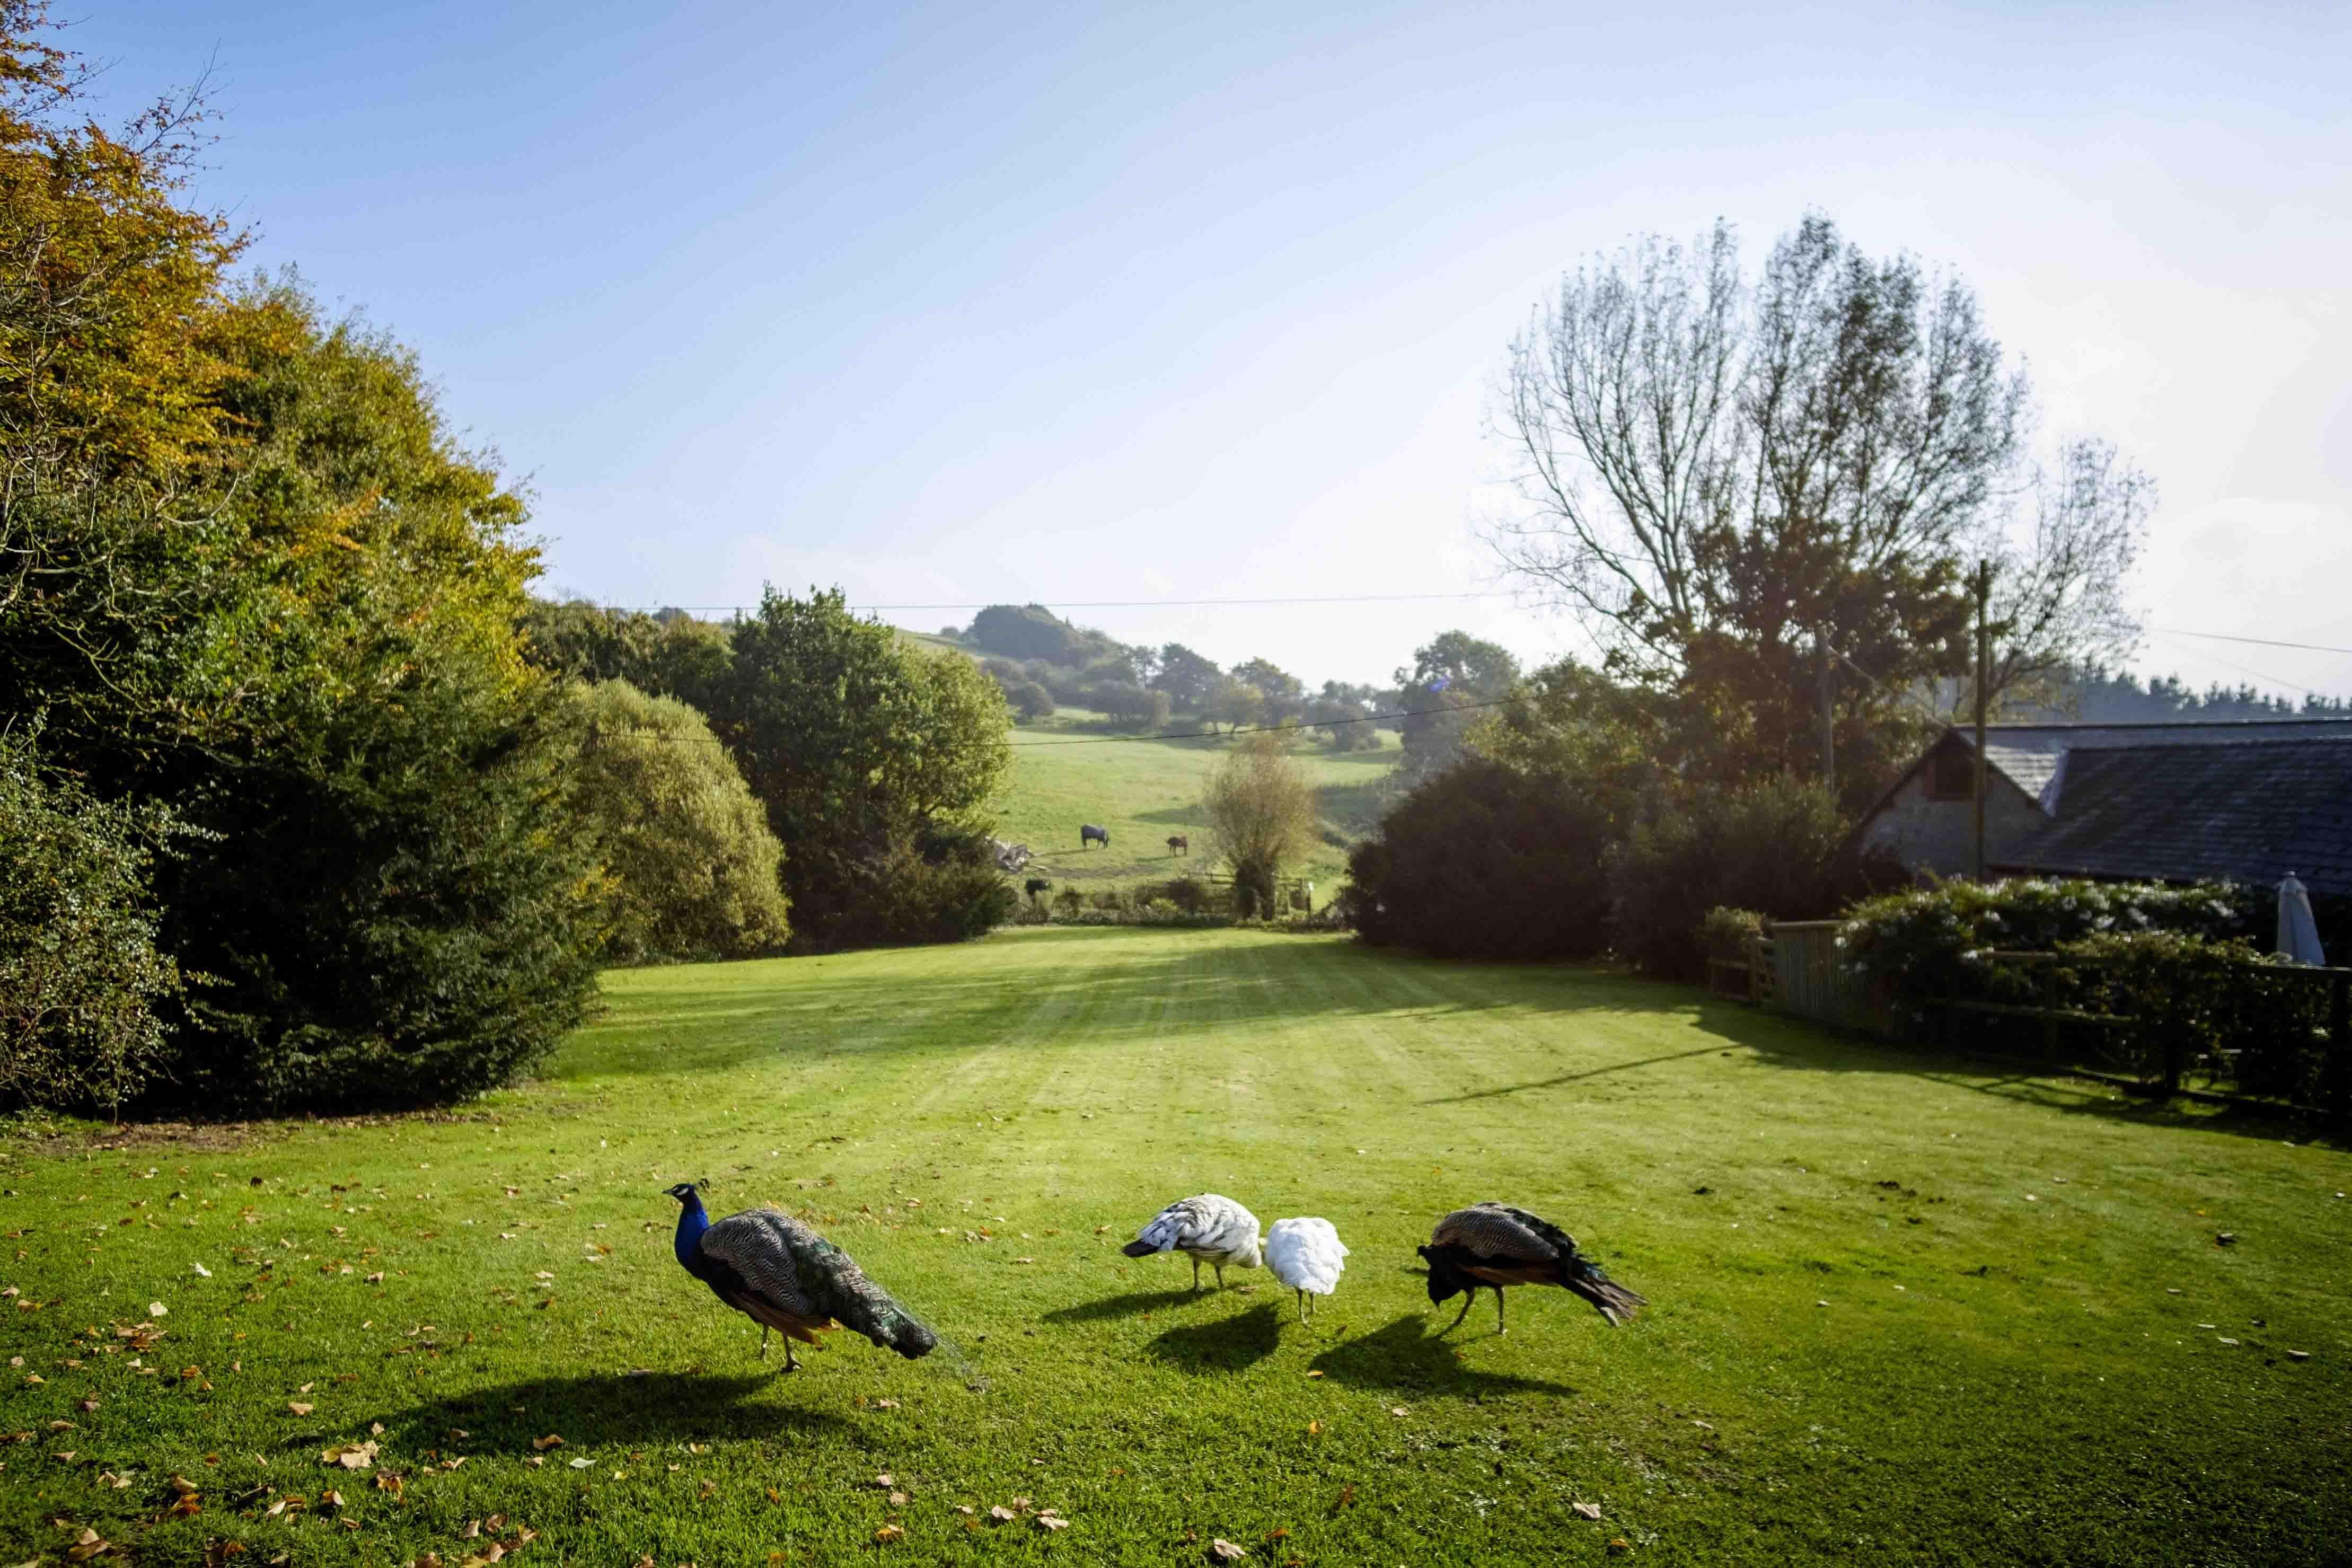 Peacocks on the lawn copy.jpg